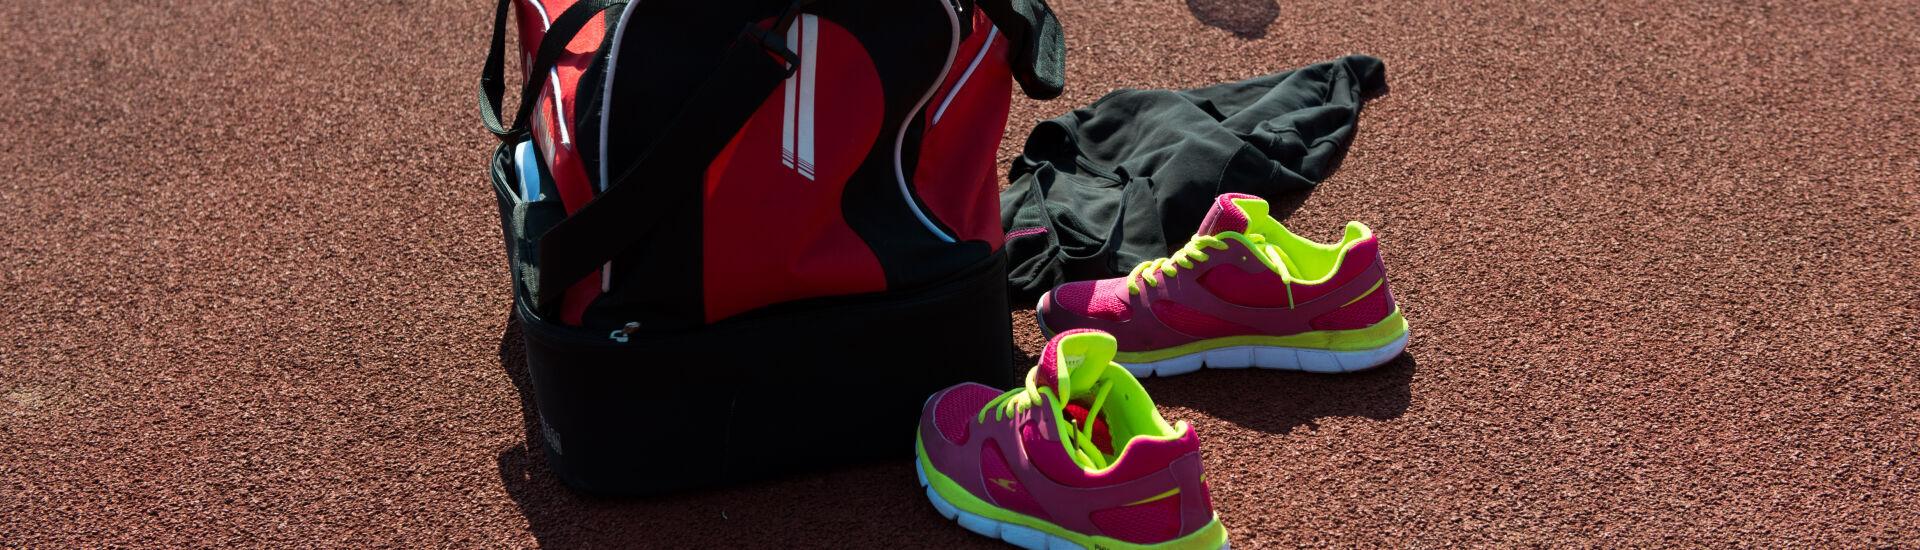 Rucksack Schuhe